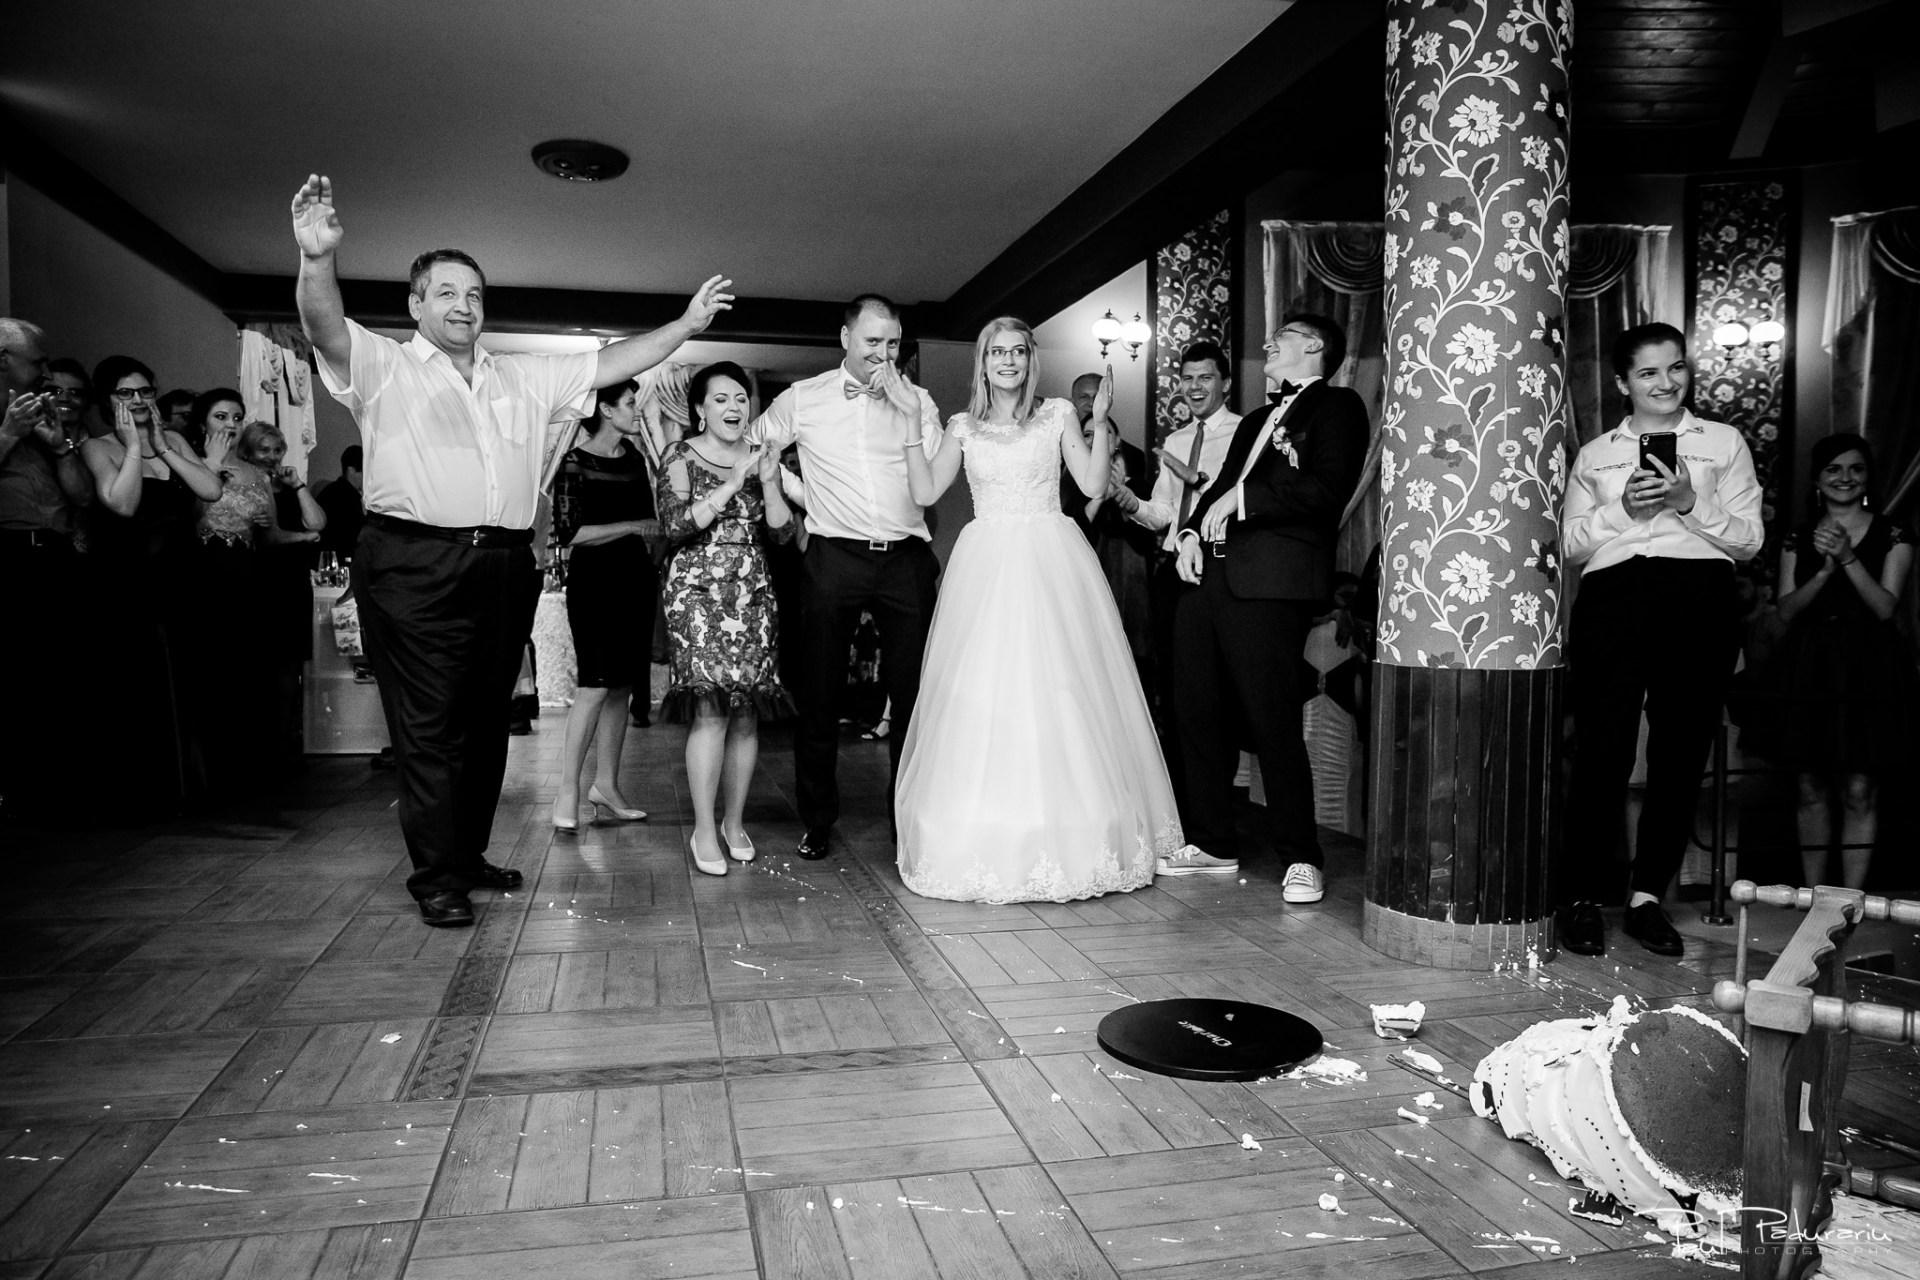 Anca si Razvan petrecere restaurant American Iasi - Paul Padurariu fotograf profesionist nunta iasi www.paulpadurariu.ro © 2018 Paul Padurariu - tort fals